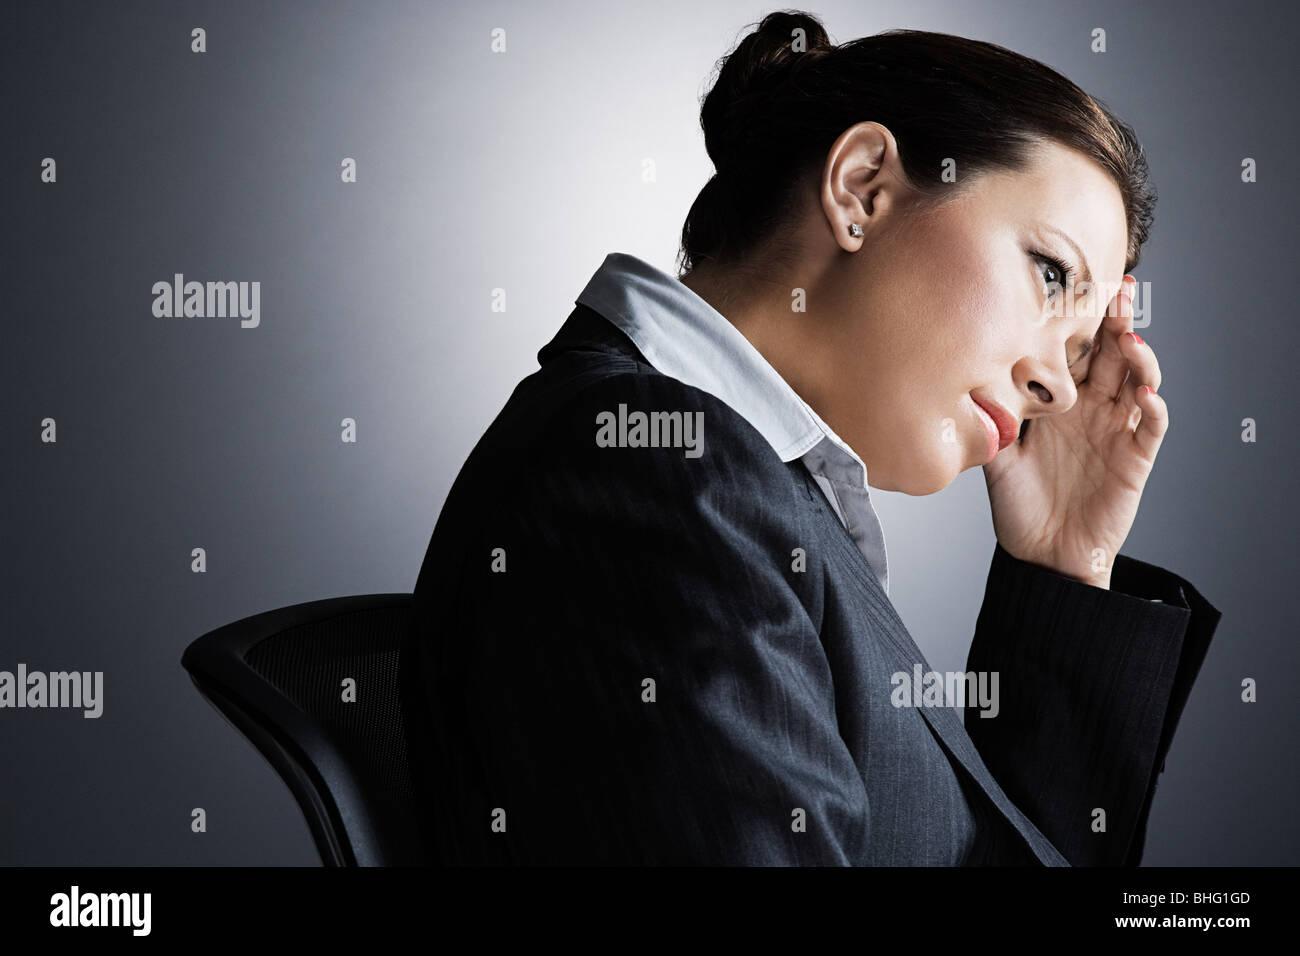 Stressed businesswoman - Stock Image